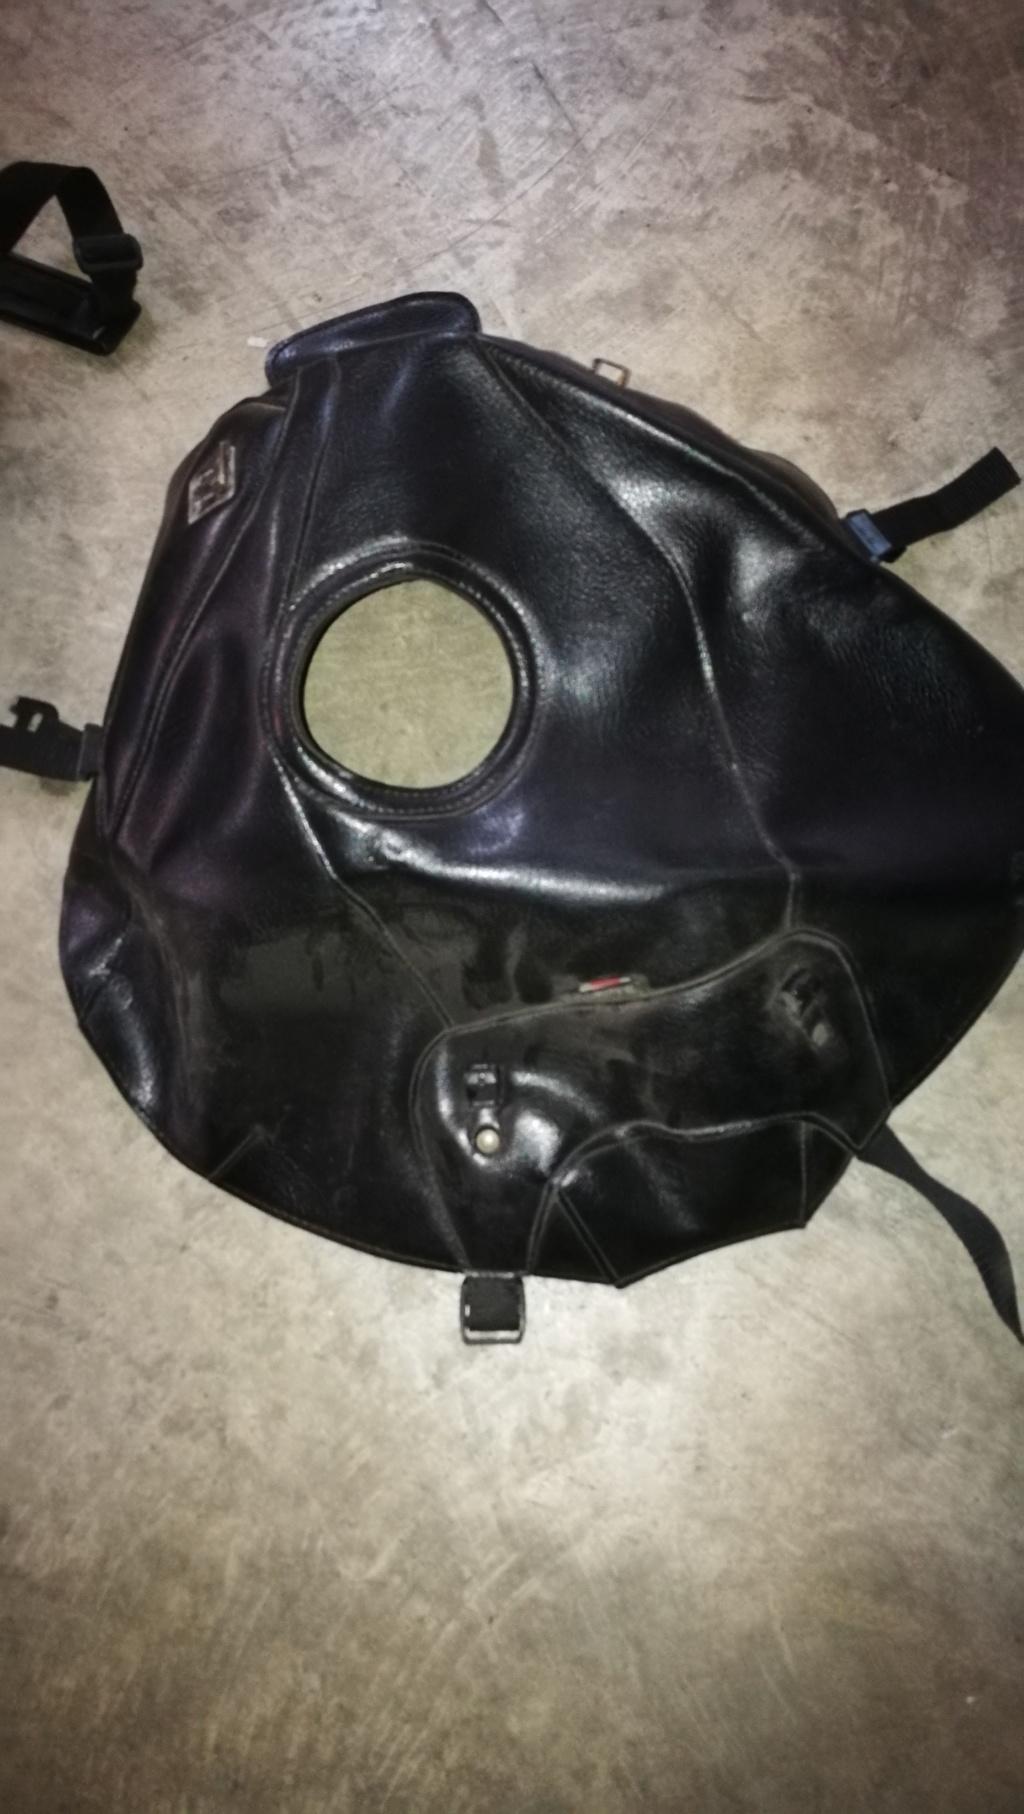 Funda bagster depósito con maleta para Bandit 400 Img_2017